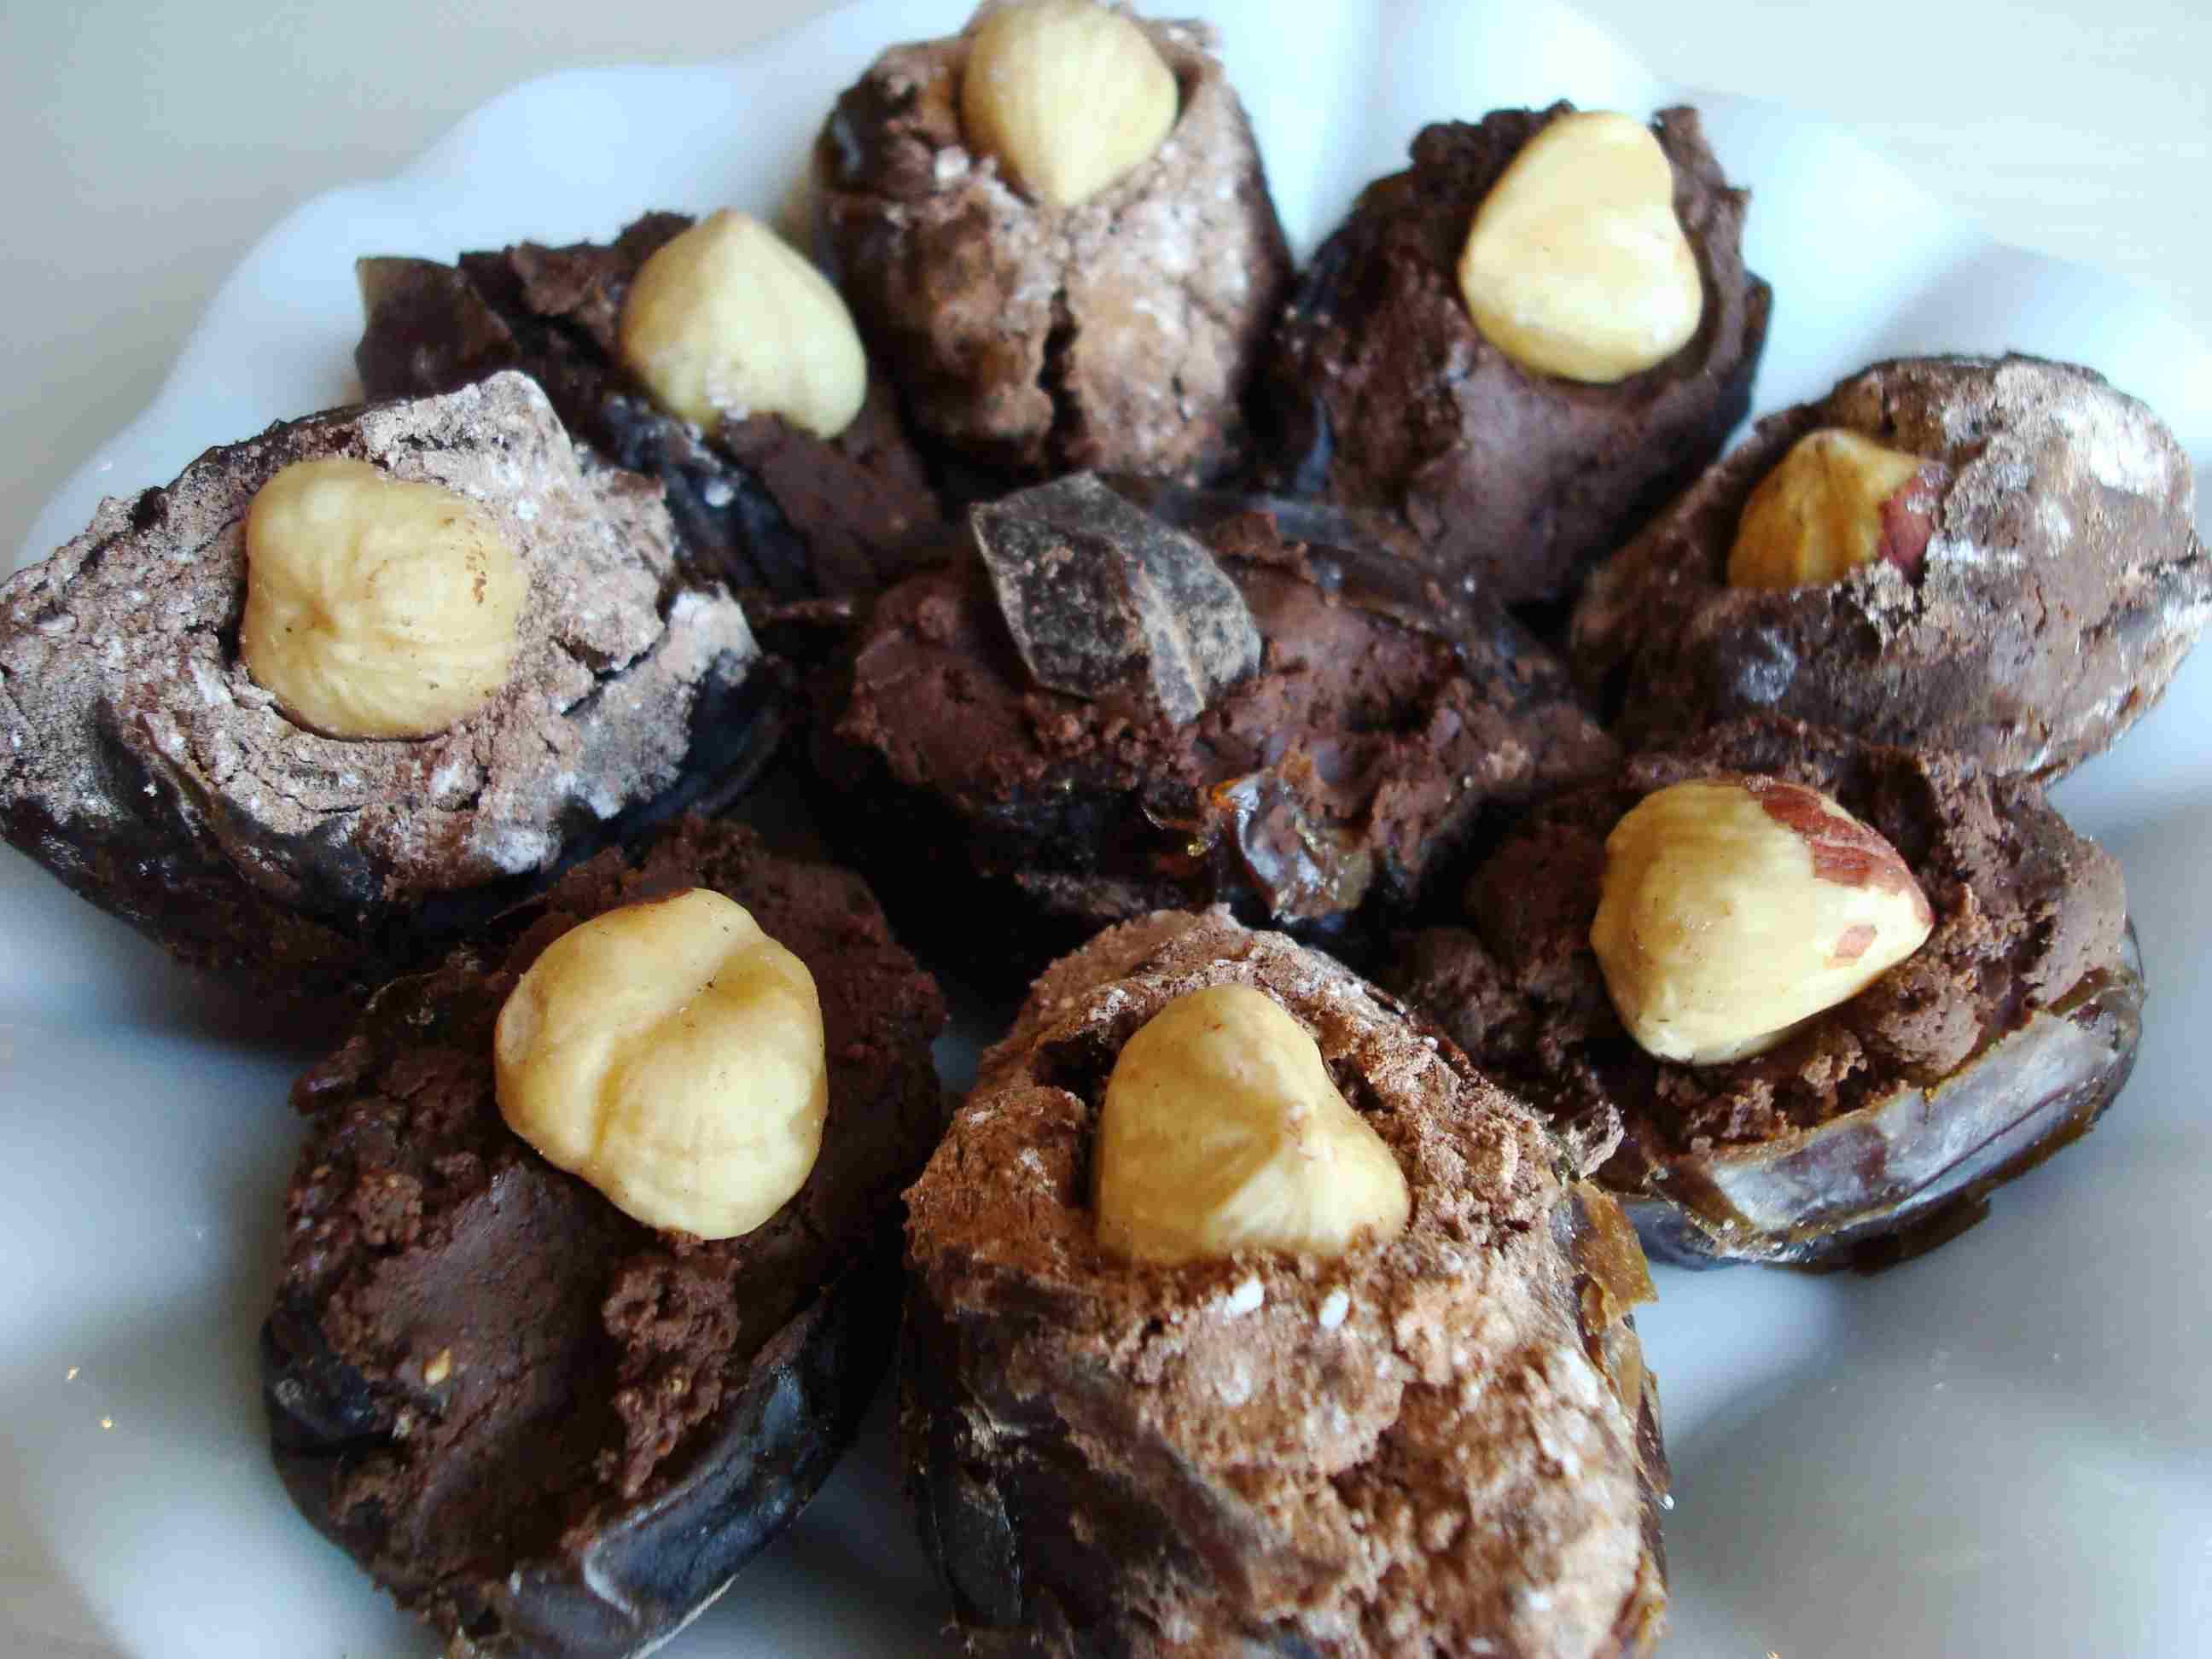 Chocolate Hazelnut Stuffed Dates